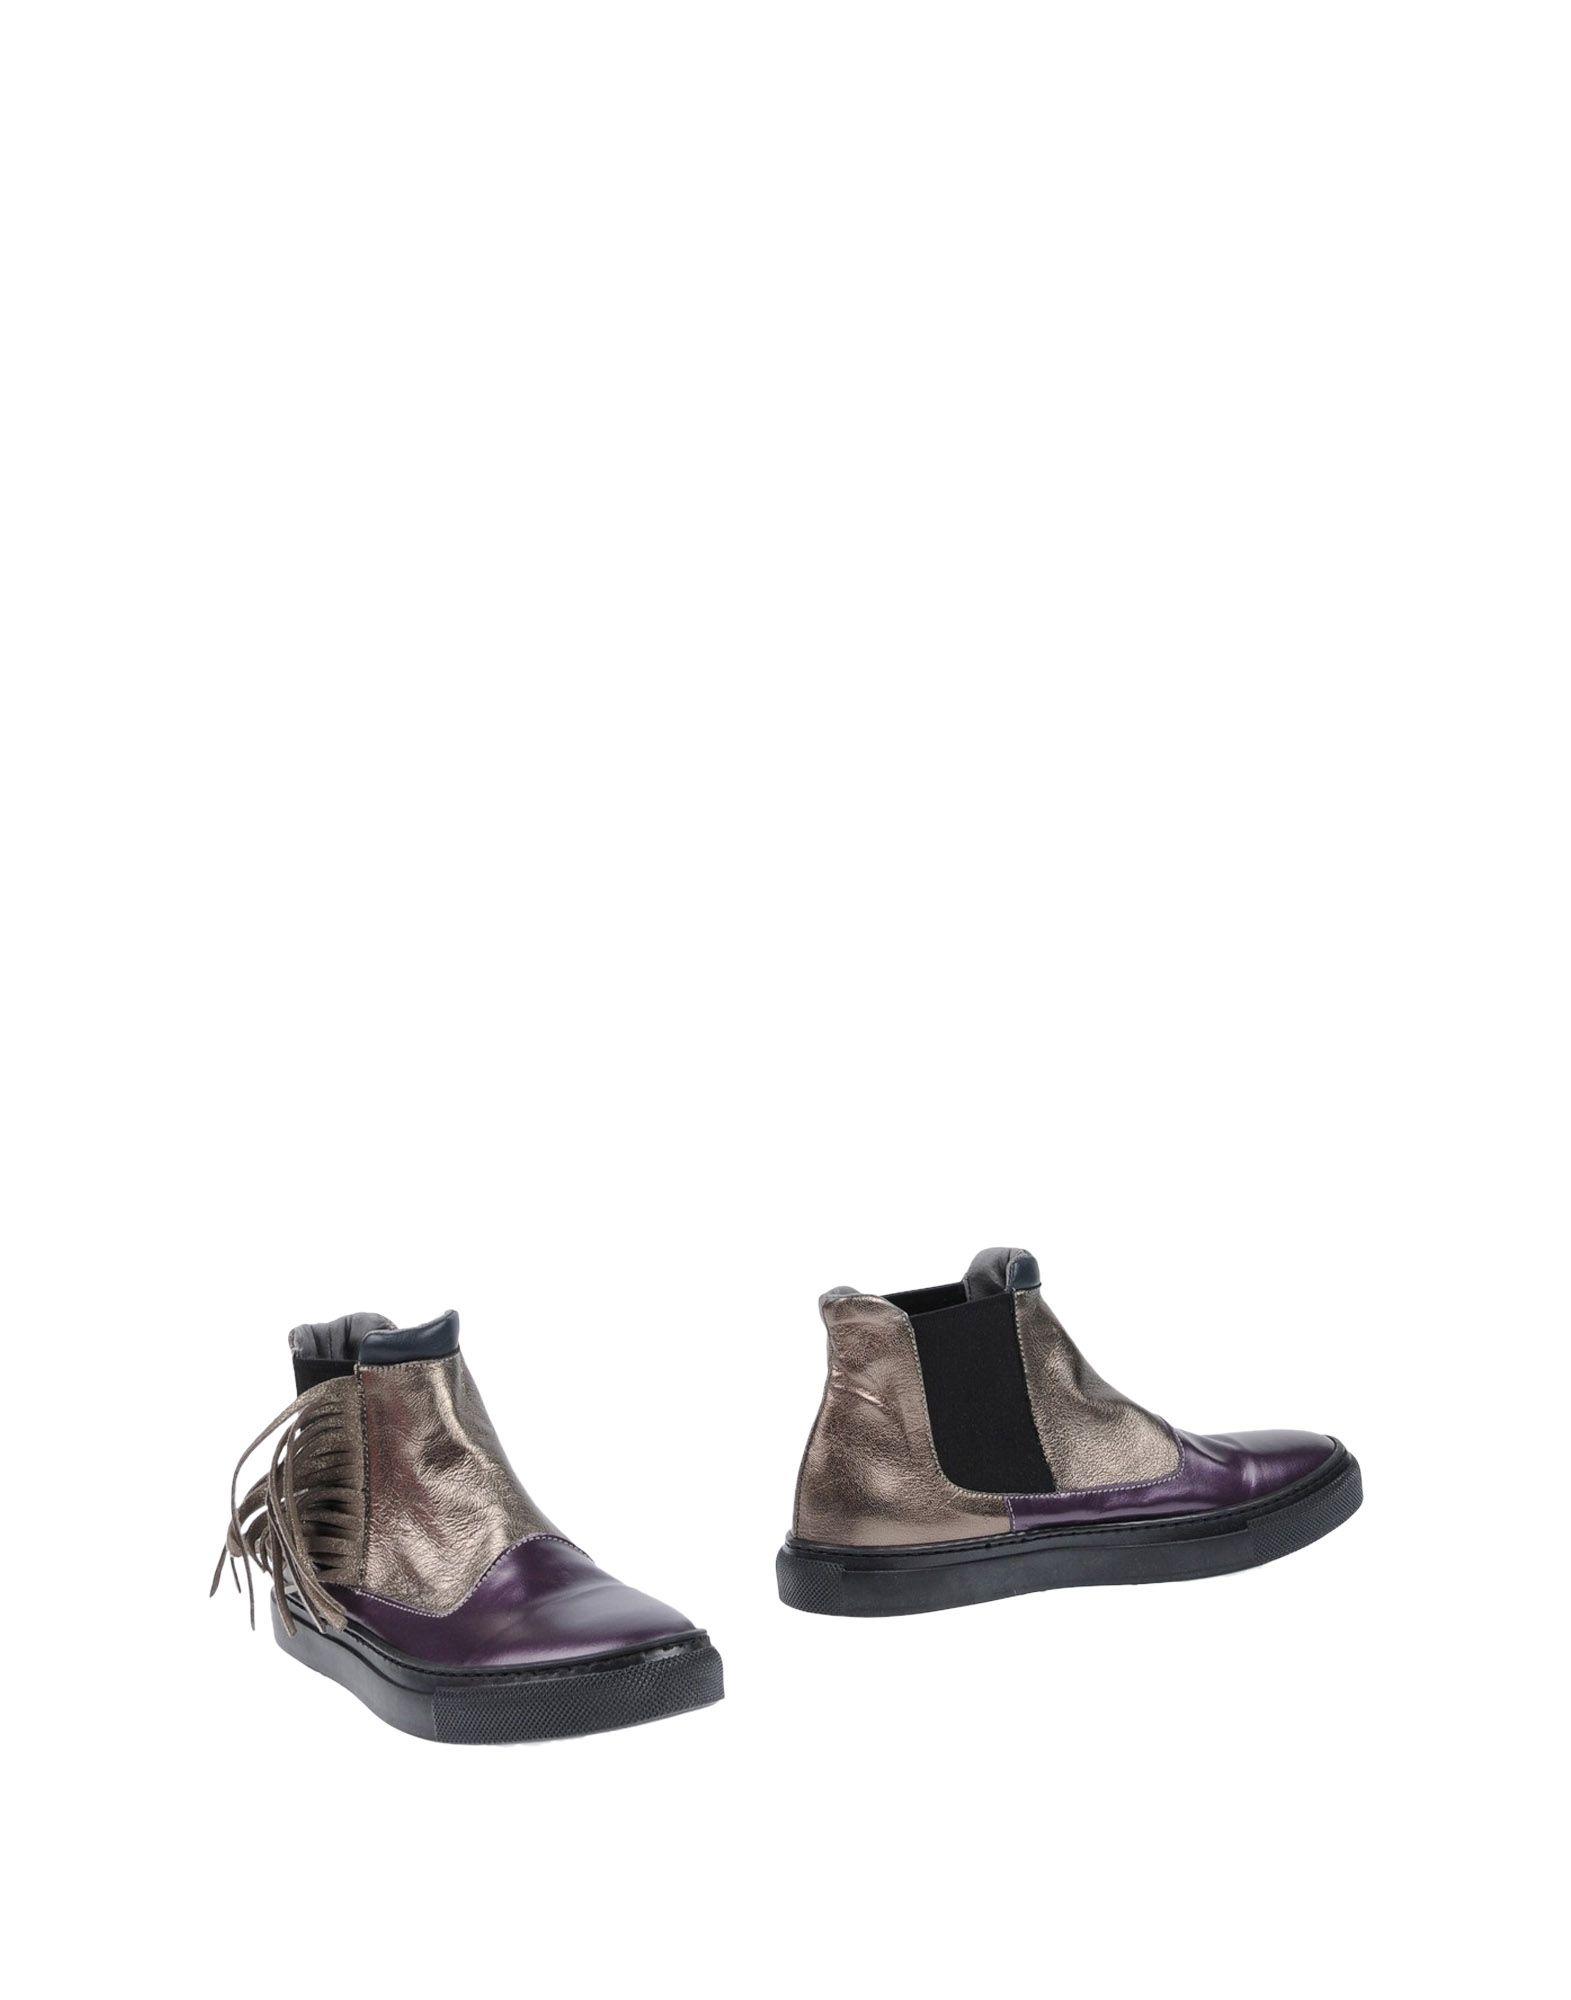 Ebarrito Chelsea Boots Damen  beliebte 11456963MO Gute Qualität beliebte  Schuhe 841dda